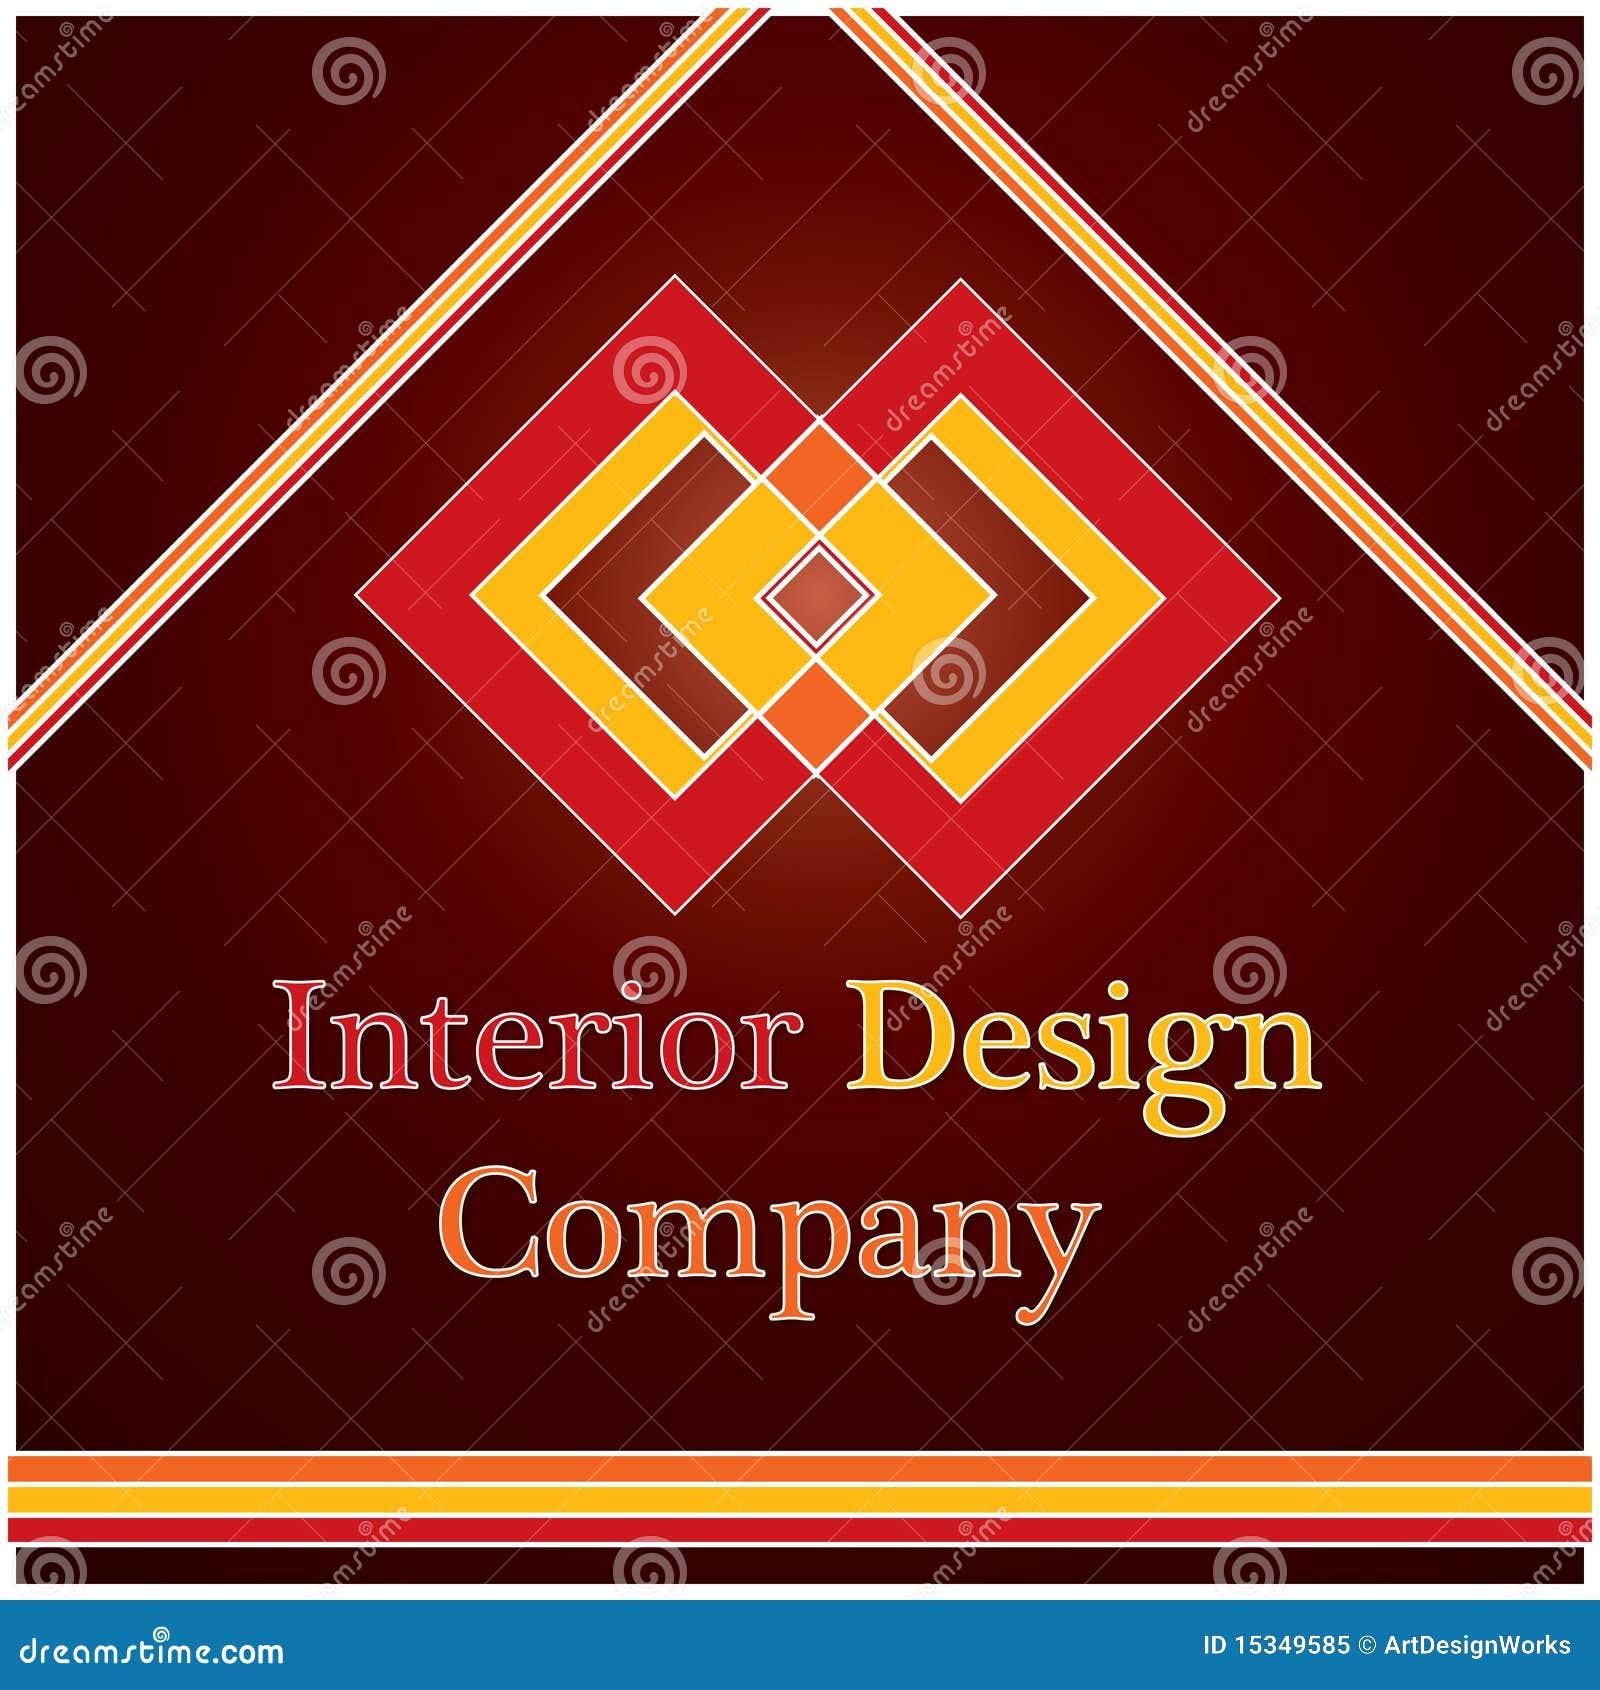 Interior Design Company Logo Royalty Free Stock Photo - Image